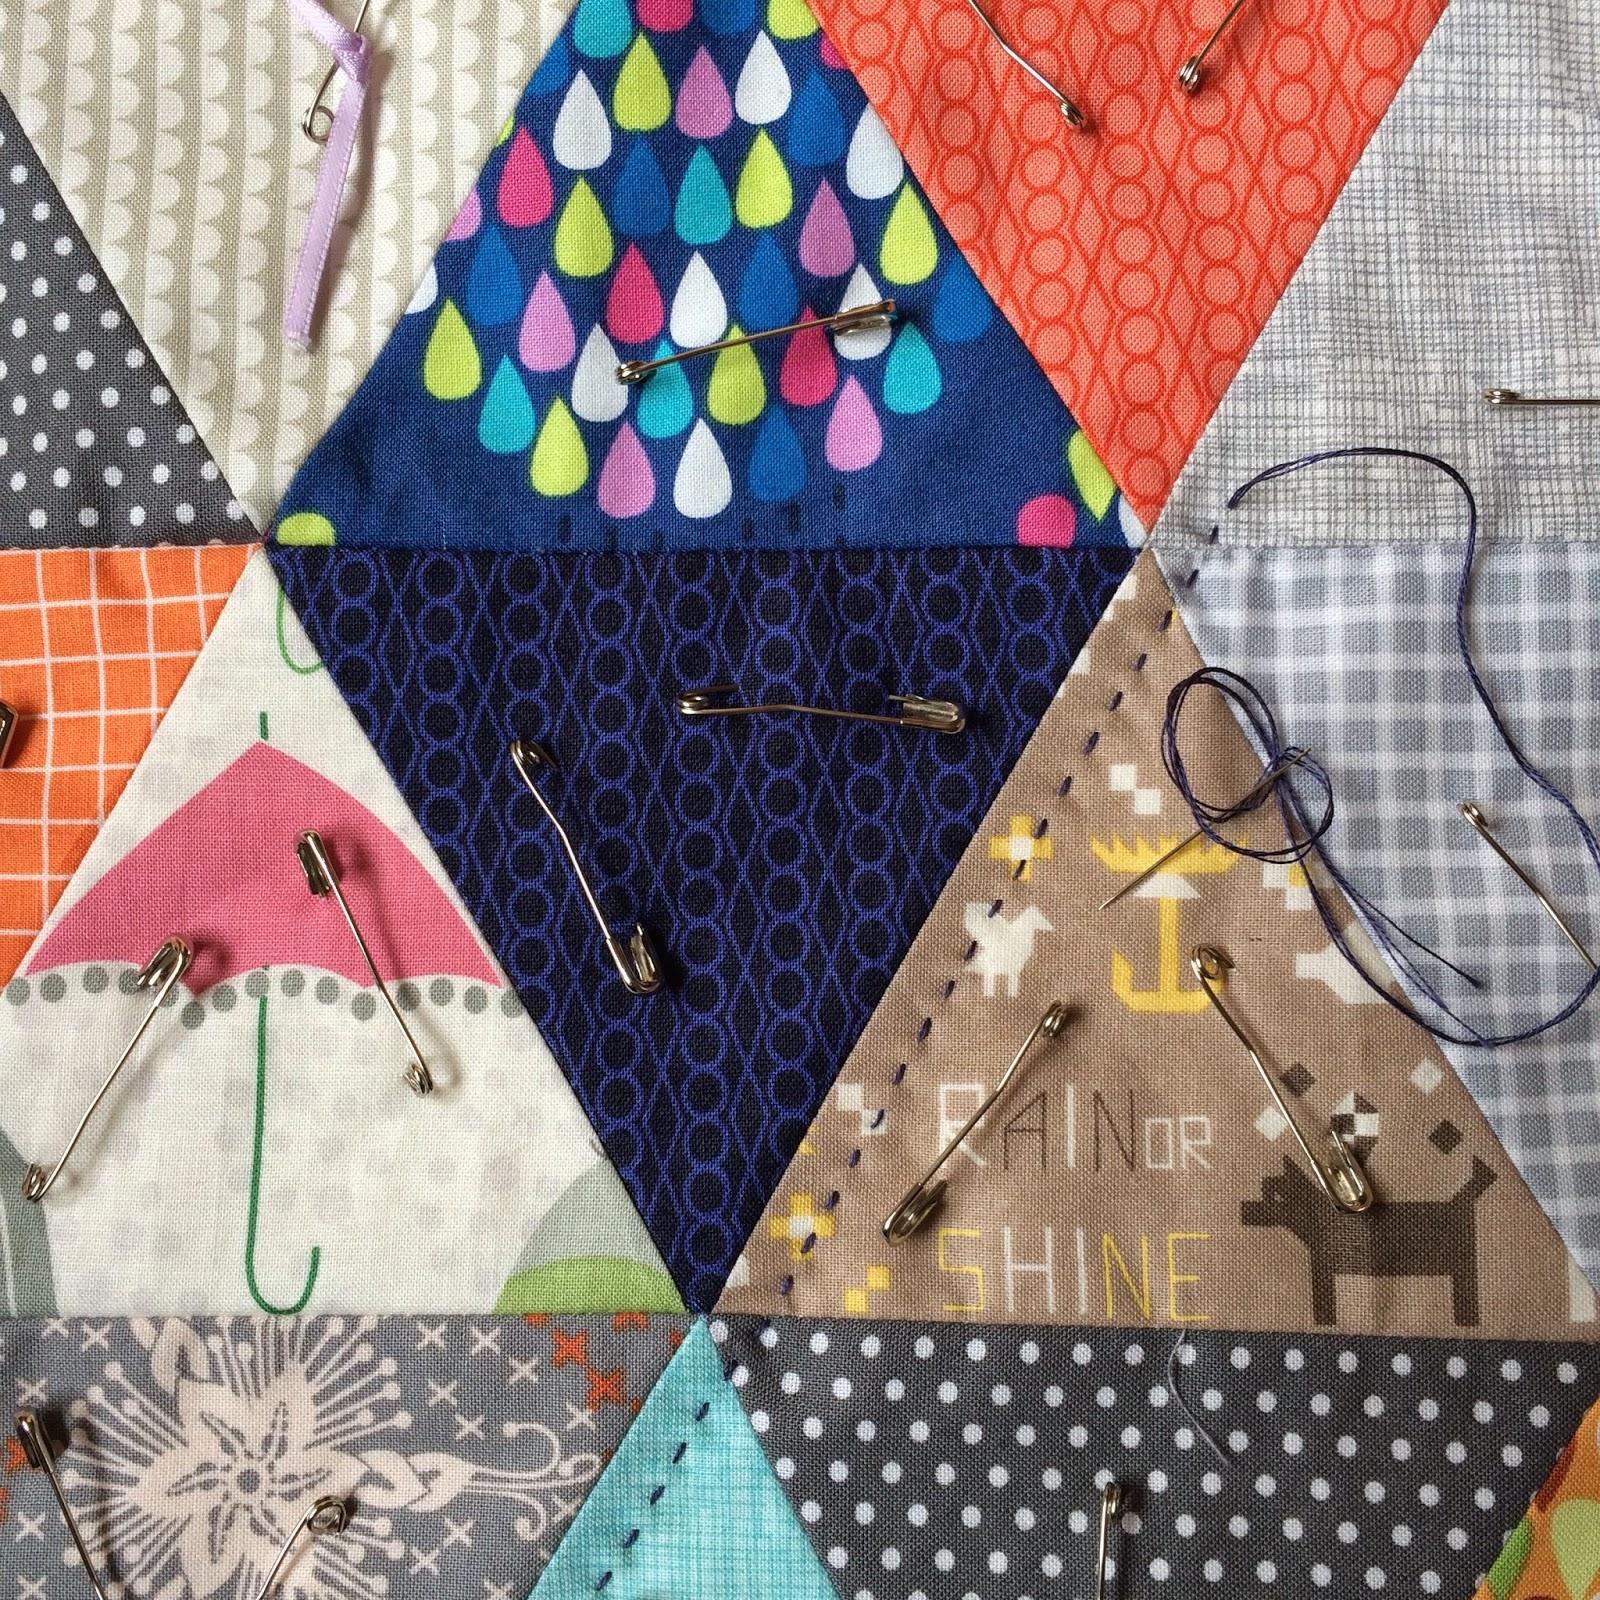 Quilting Stitch Patterns Interesting Decorating Design